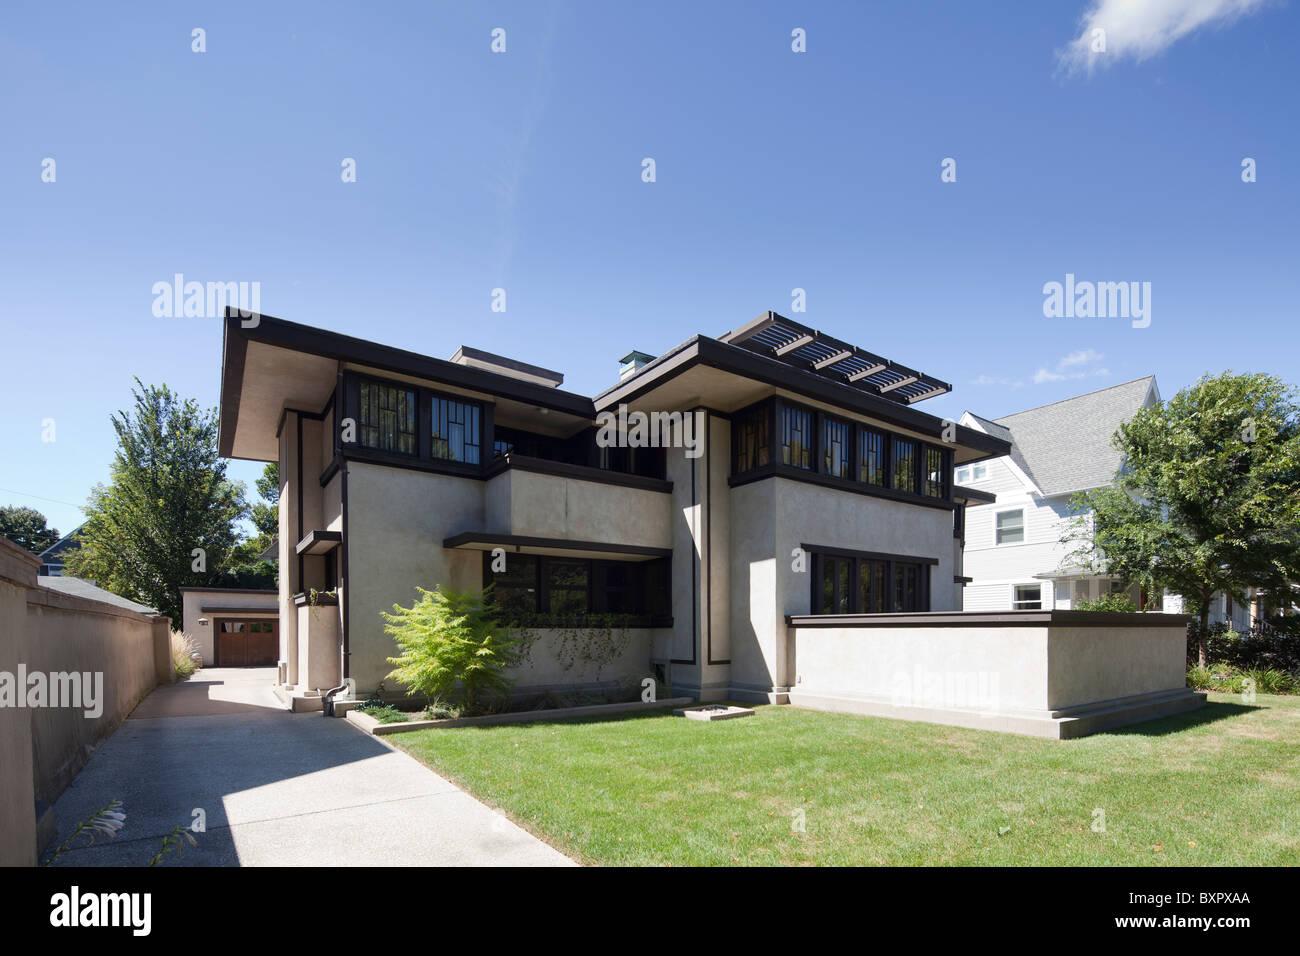 Oscar B. Balch Haus von Frank Lloyd Wright, Eiche Park, Chicago, Illinois, USA Stockbild